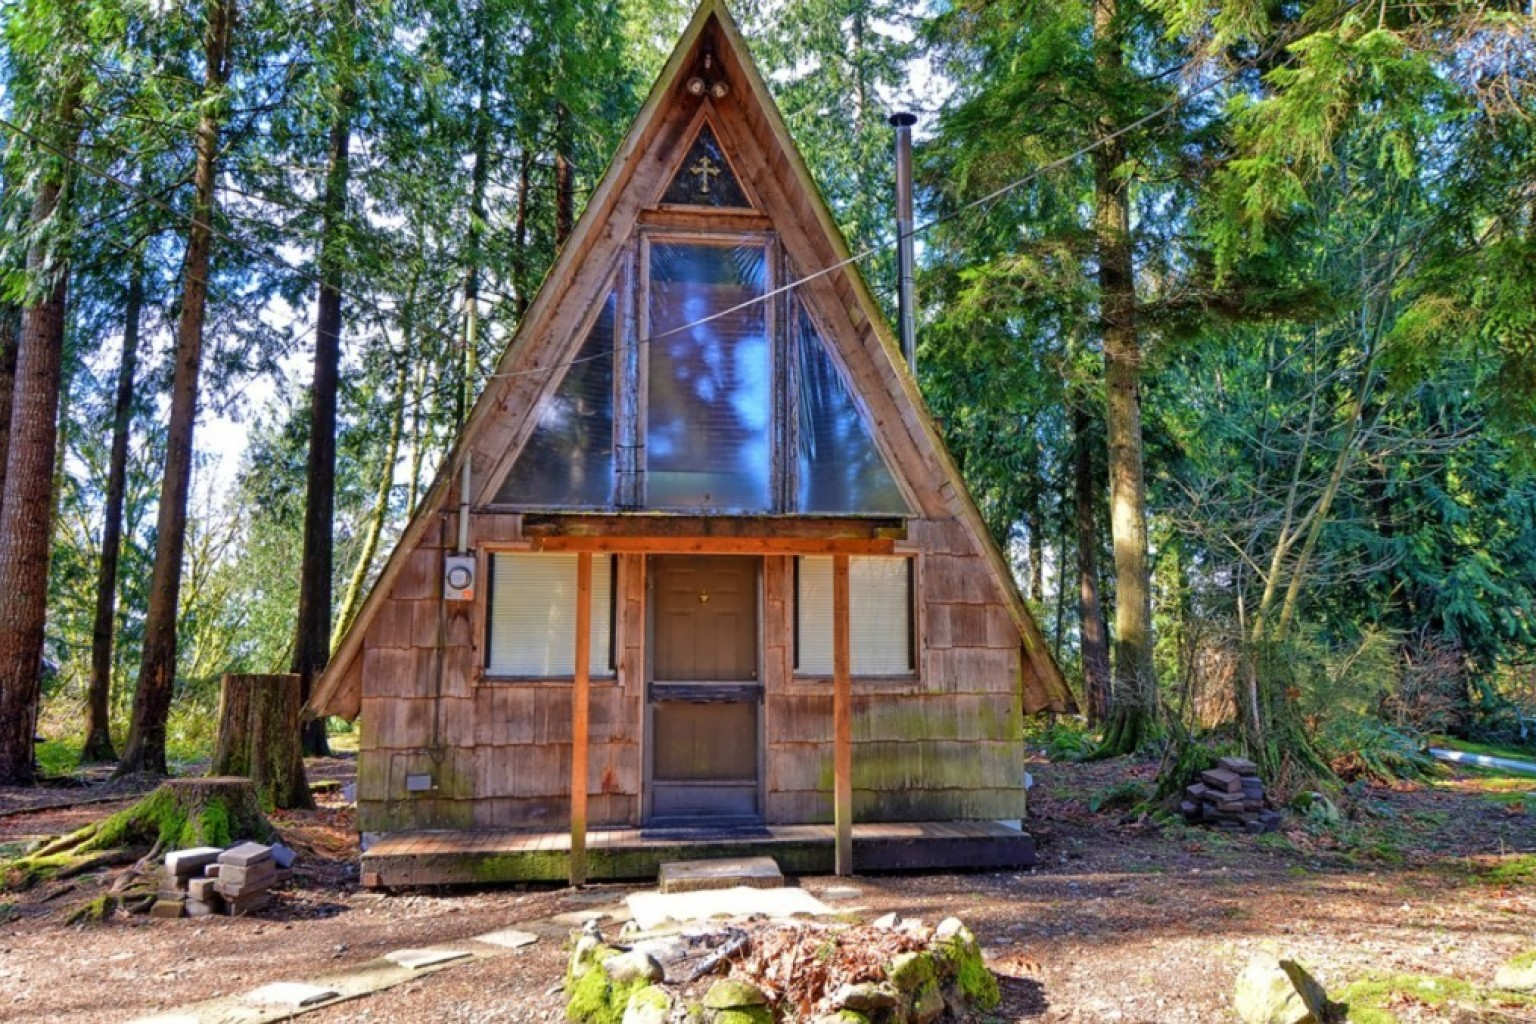 frame tiny home sale perfect summer getaway frame house kits frame cabin frame house